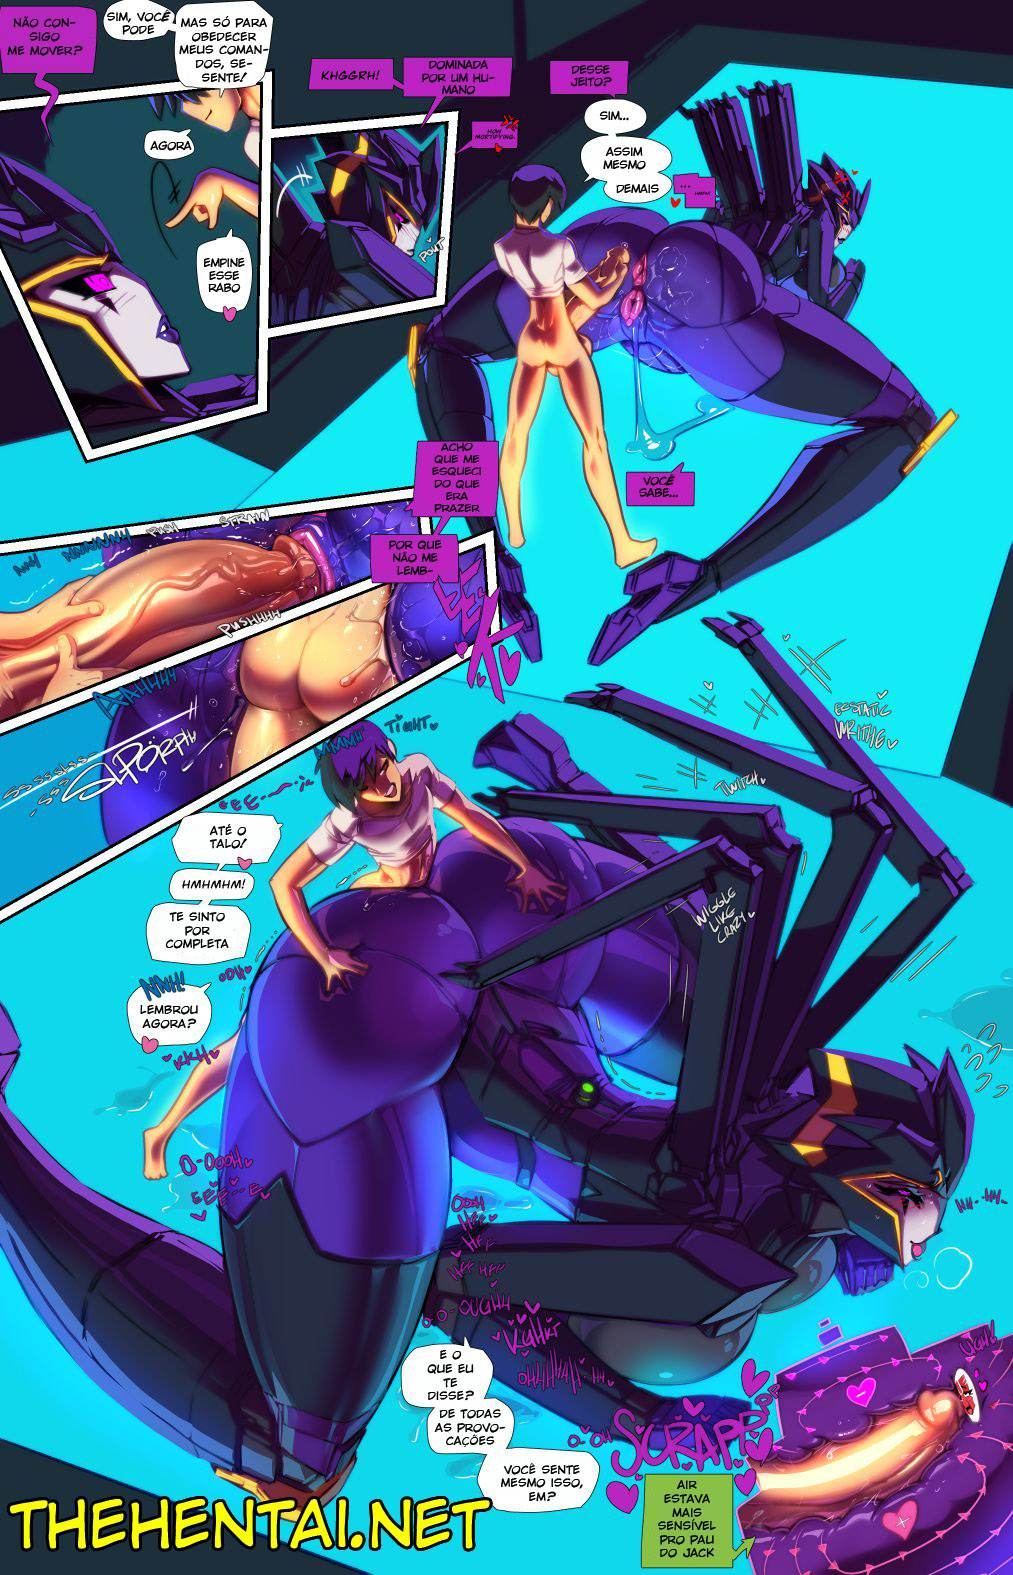 The Full Course tranformers Hentai pt br 08 - hentai, exclusiva, comics-hq